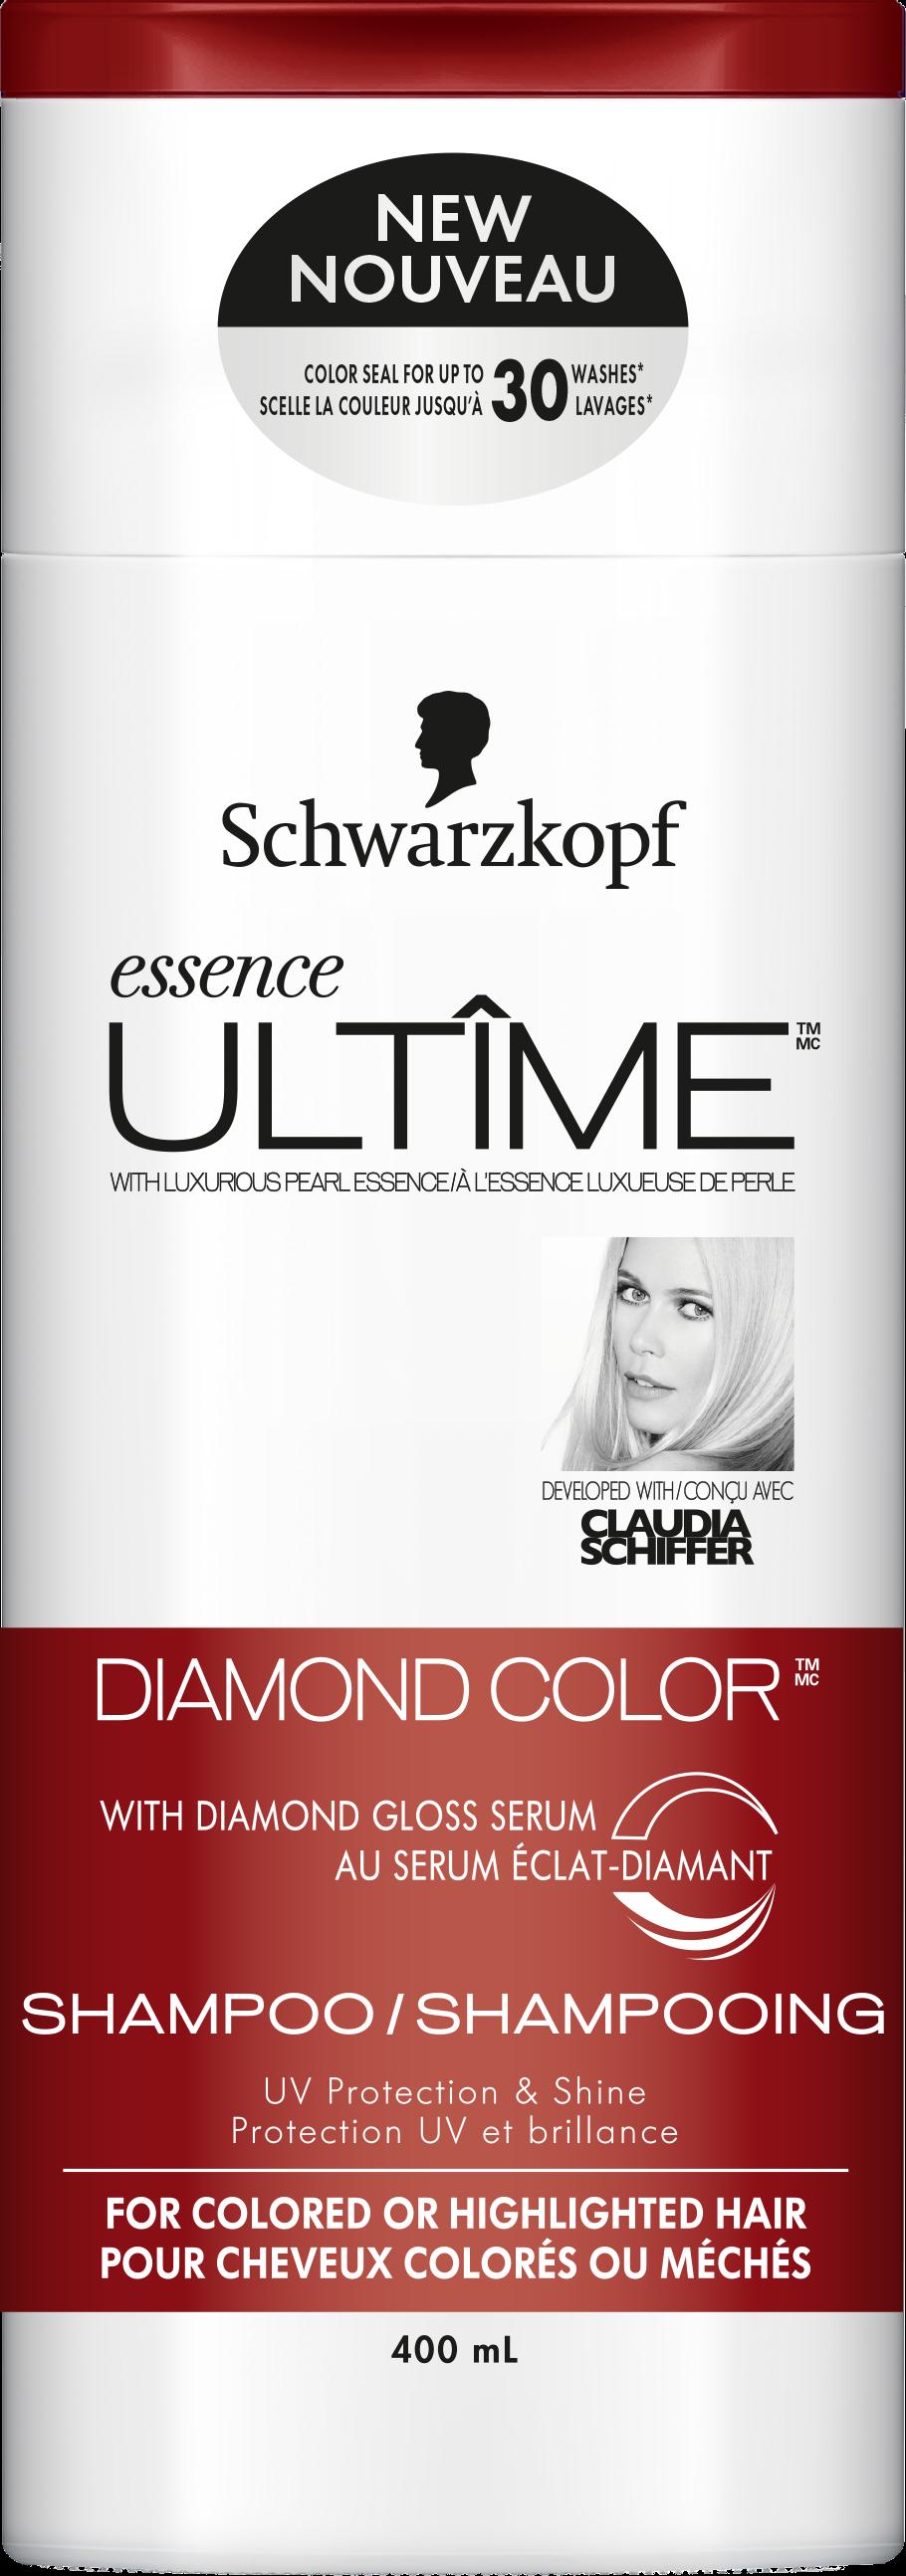 Schwarzkopf Essence ULTIME Diamond Colour Shampoo